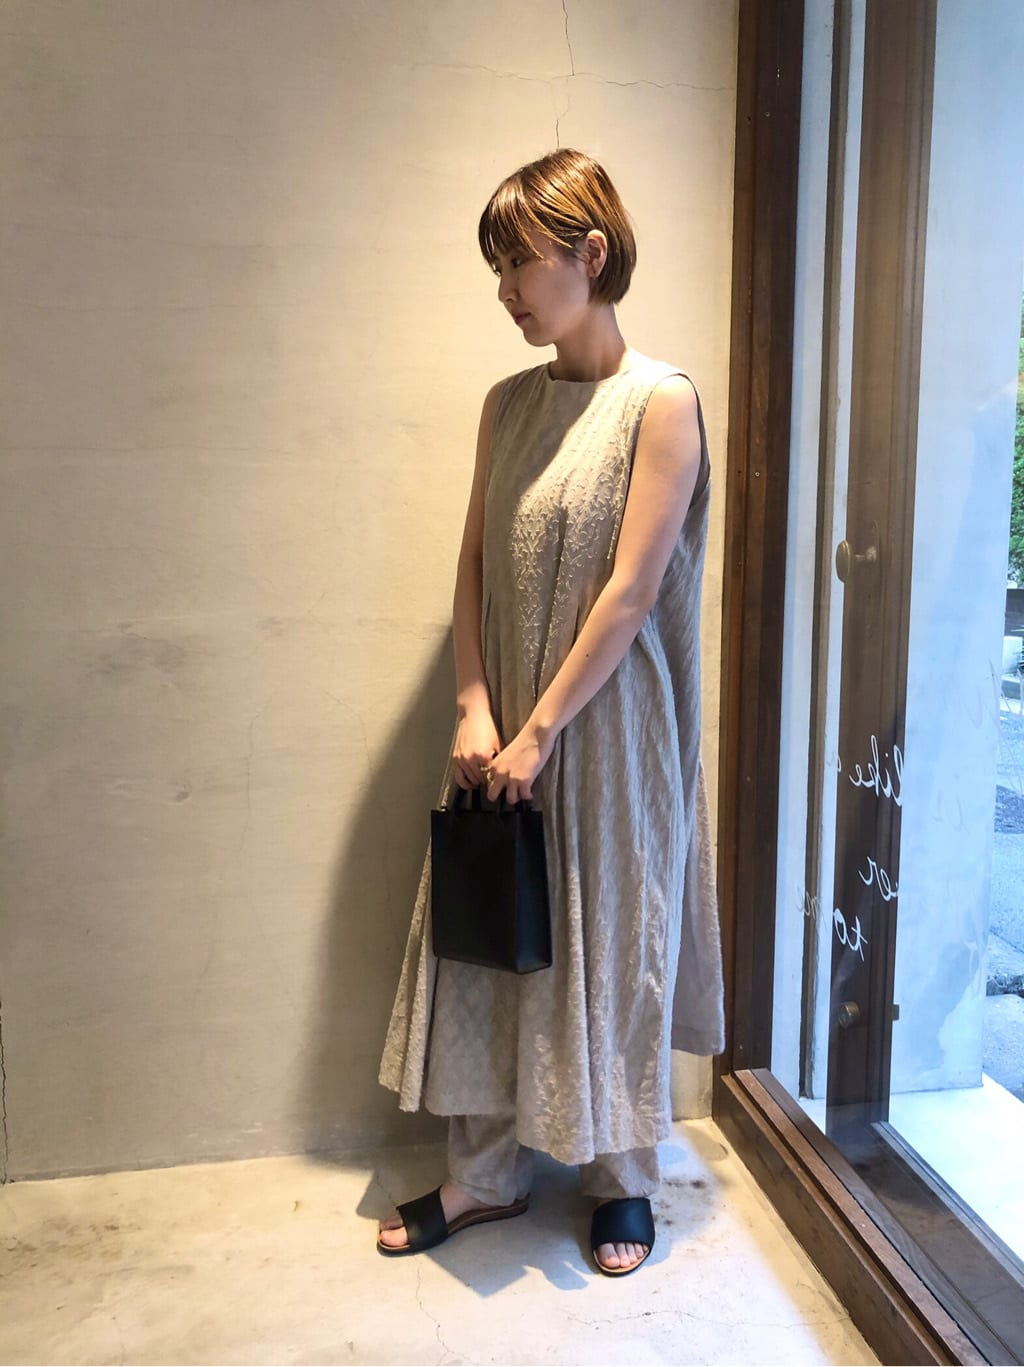 yuni 神戸路面 身長:155cm 2021.06.25